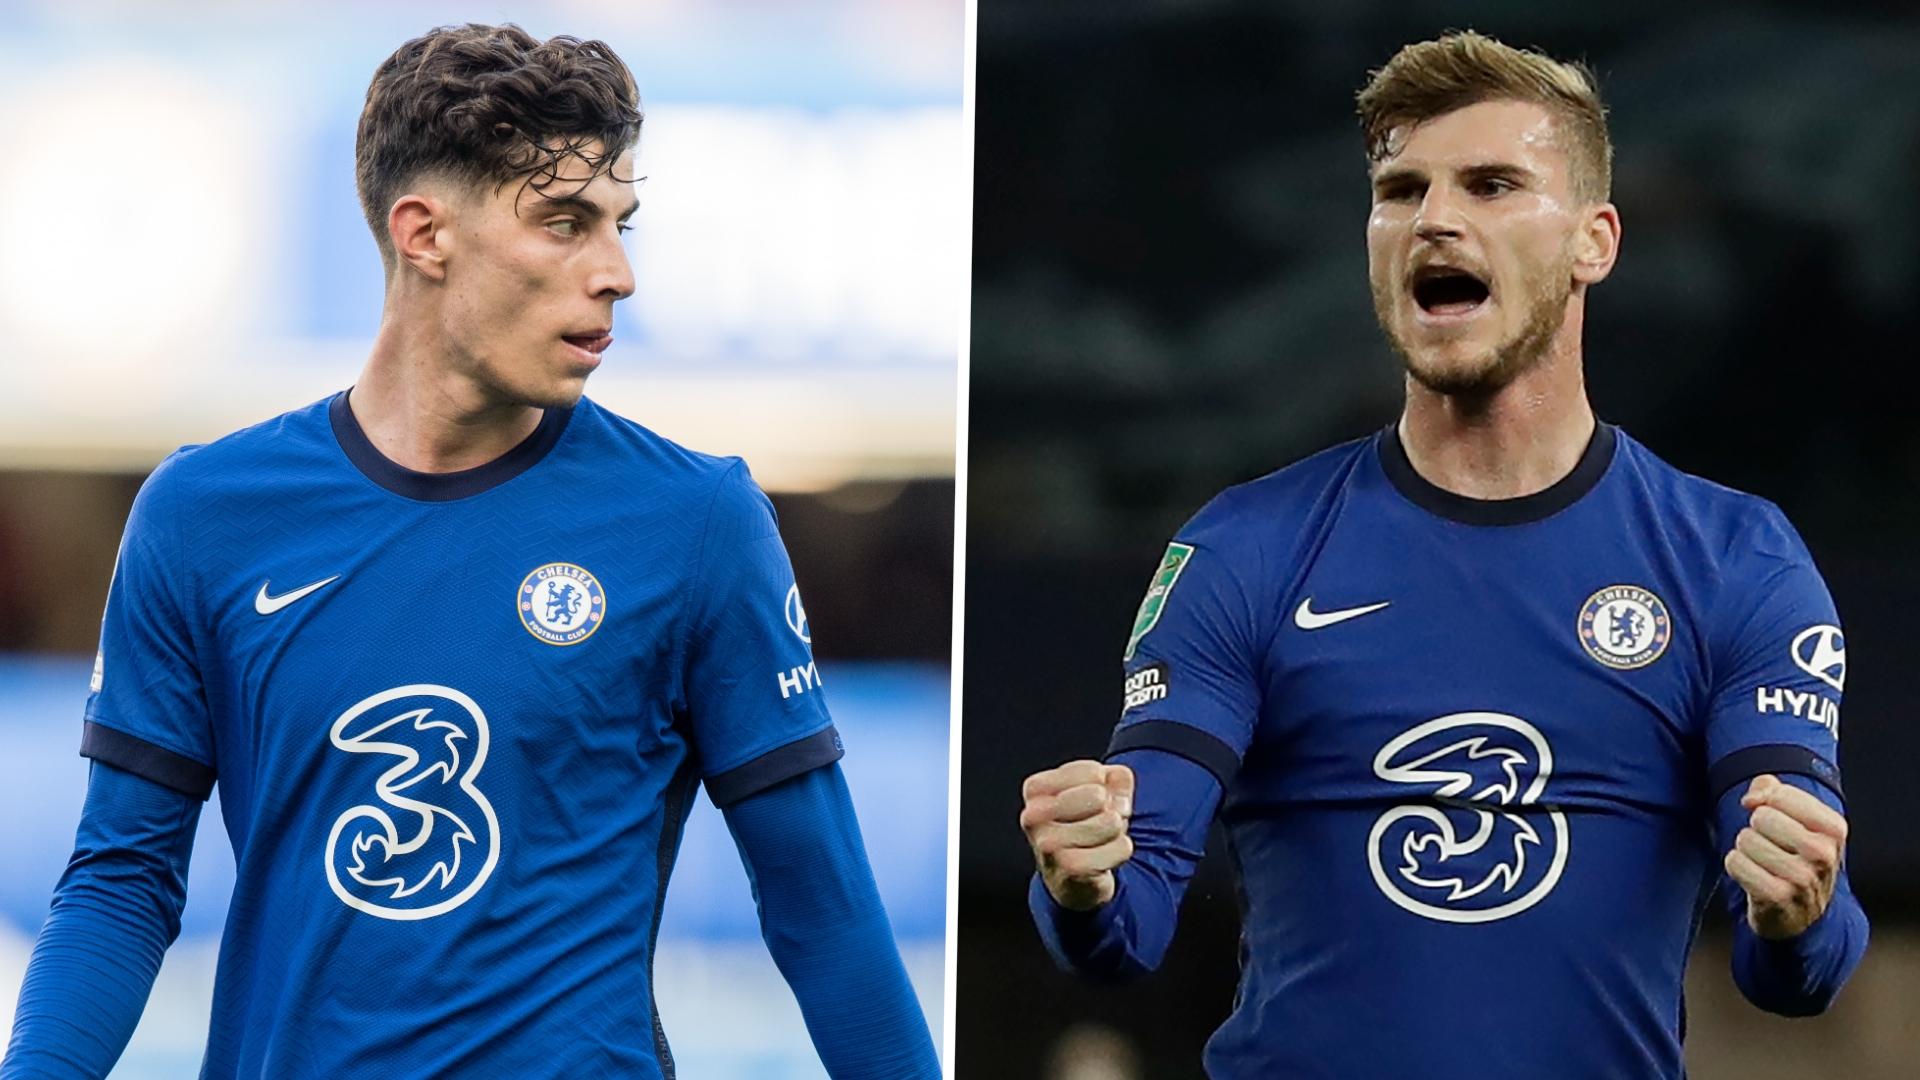 'Werner & Havertz struggles are normal' - Man City star Gundogan backs Chelsea duo to come good at Stamford Bridge